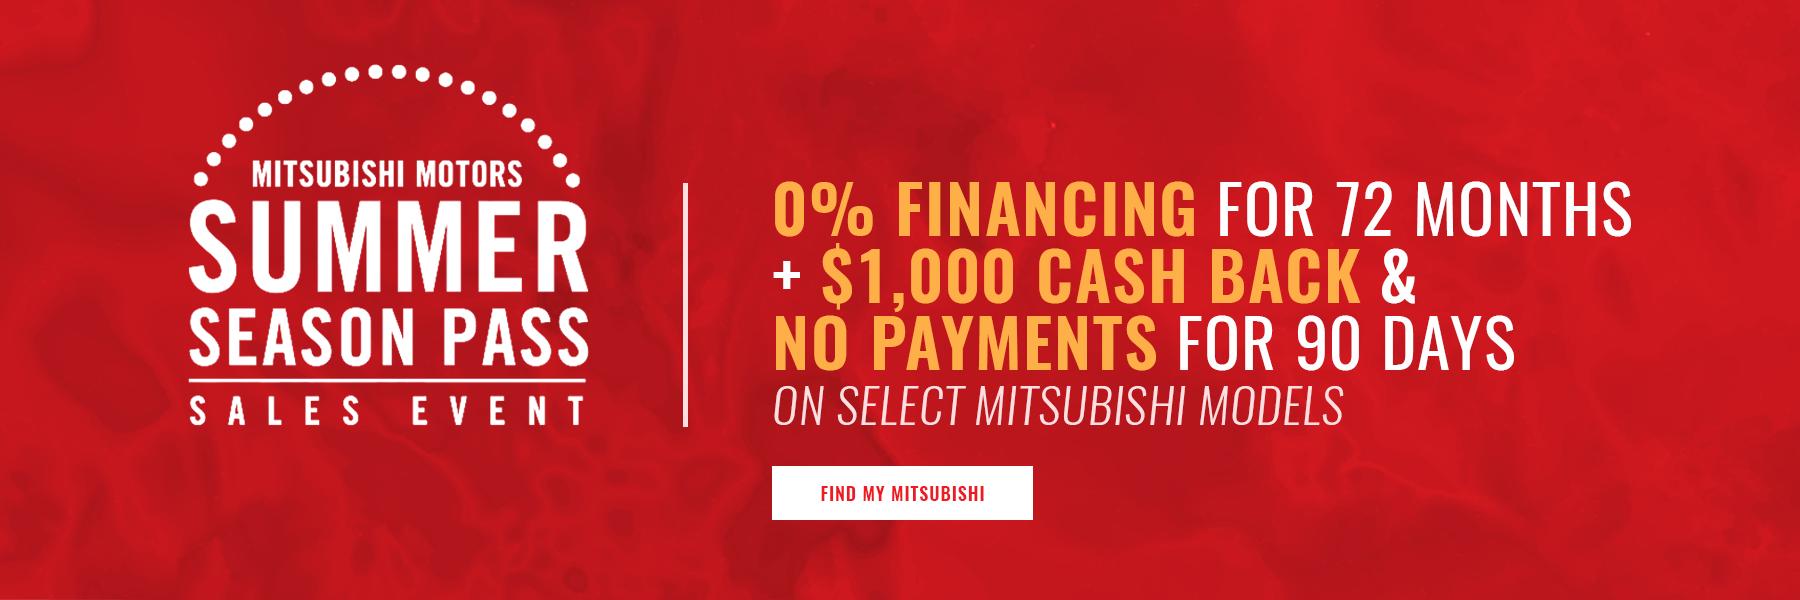 Mitsubishi Summer Season Pass Concord NH